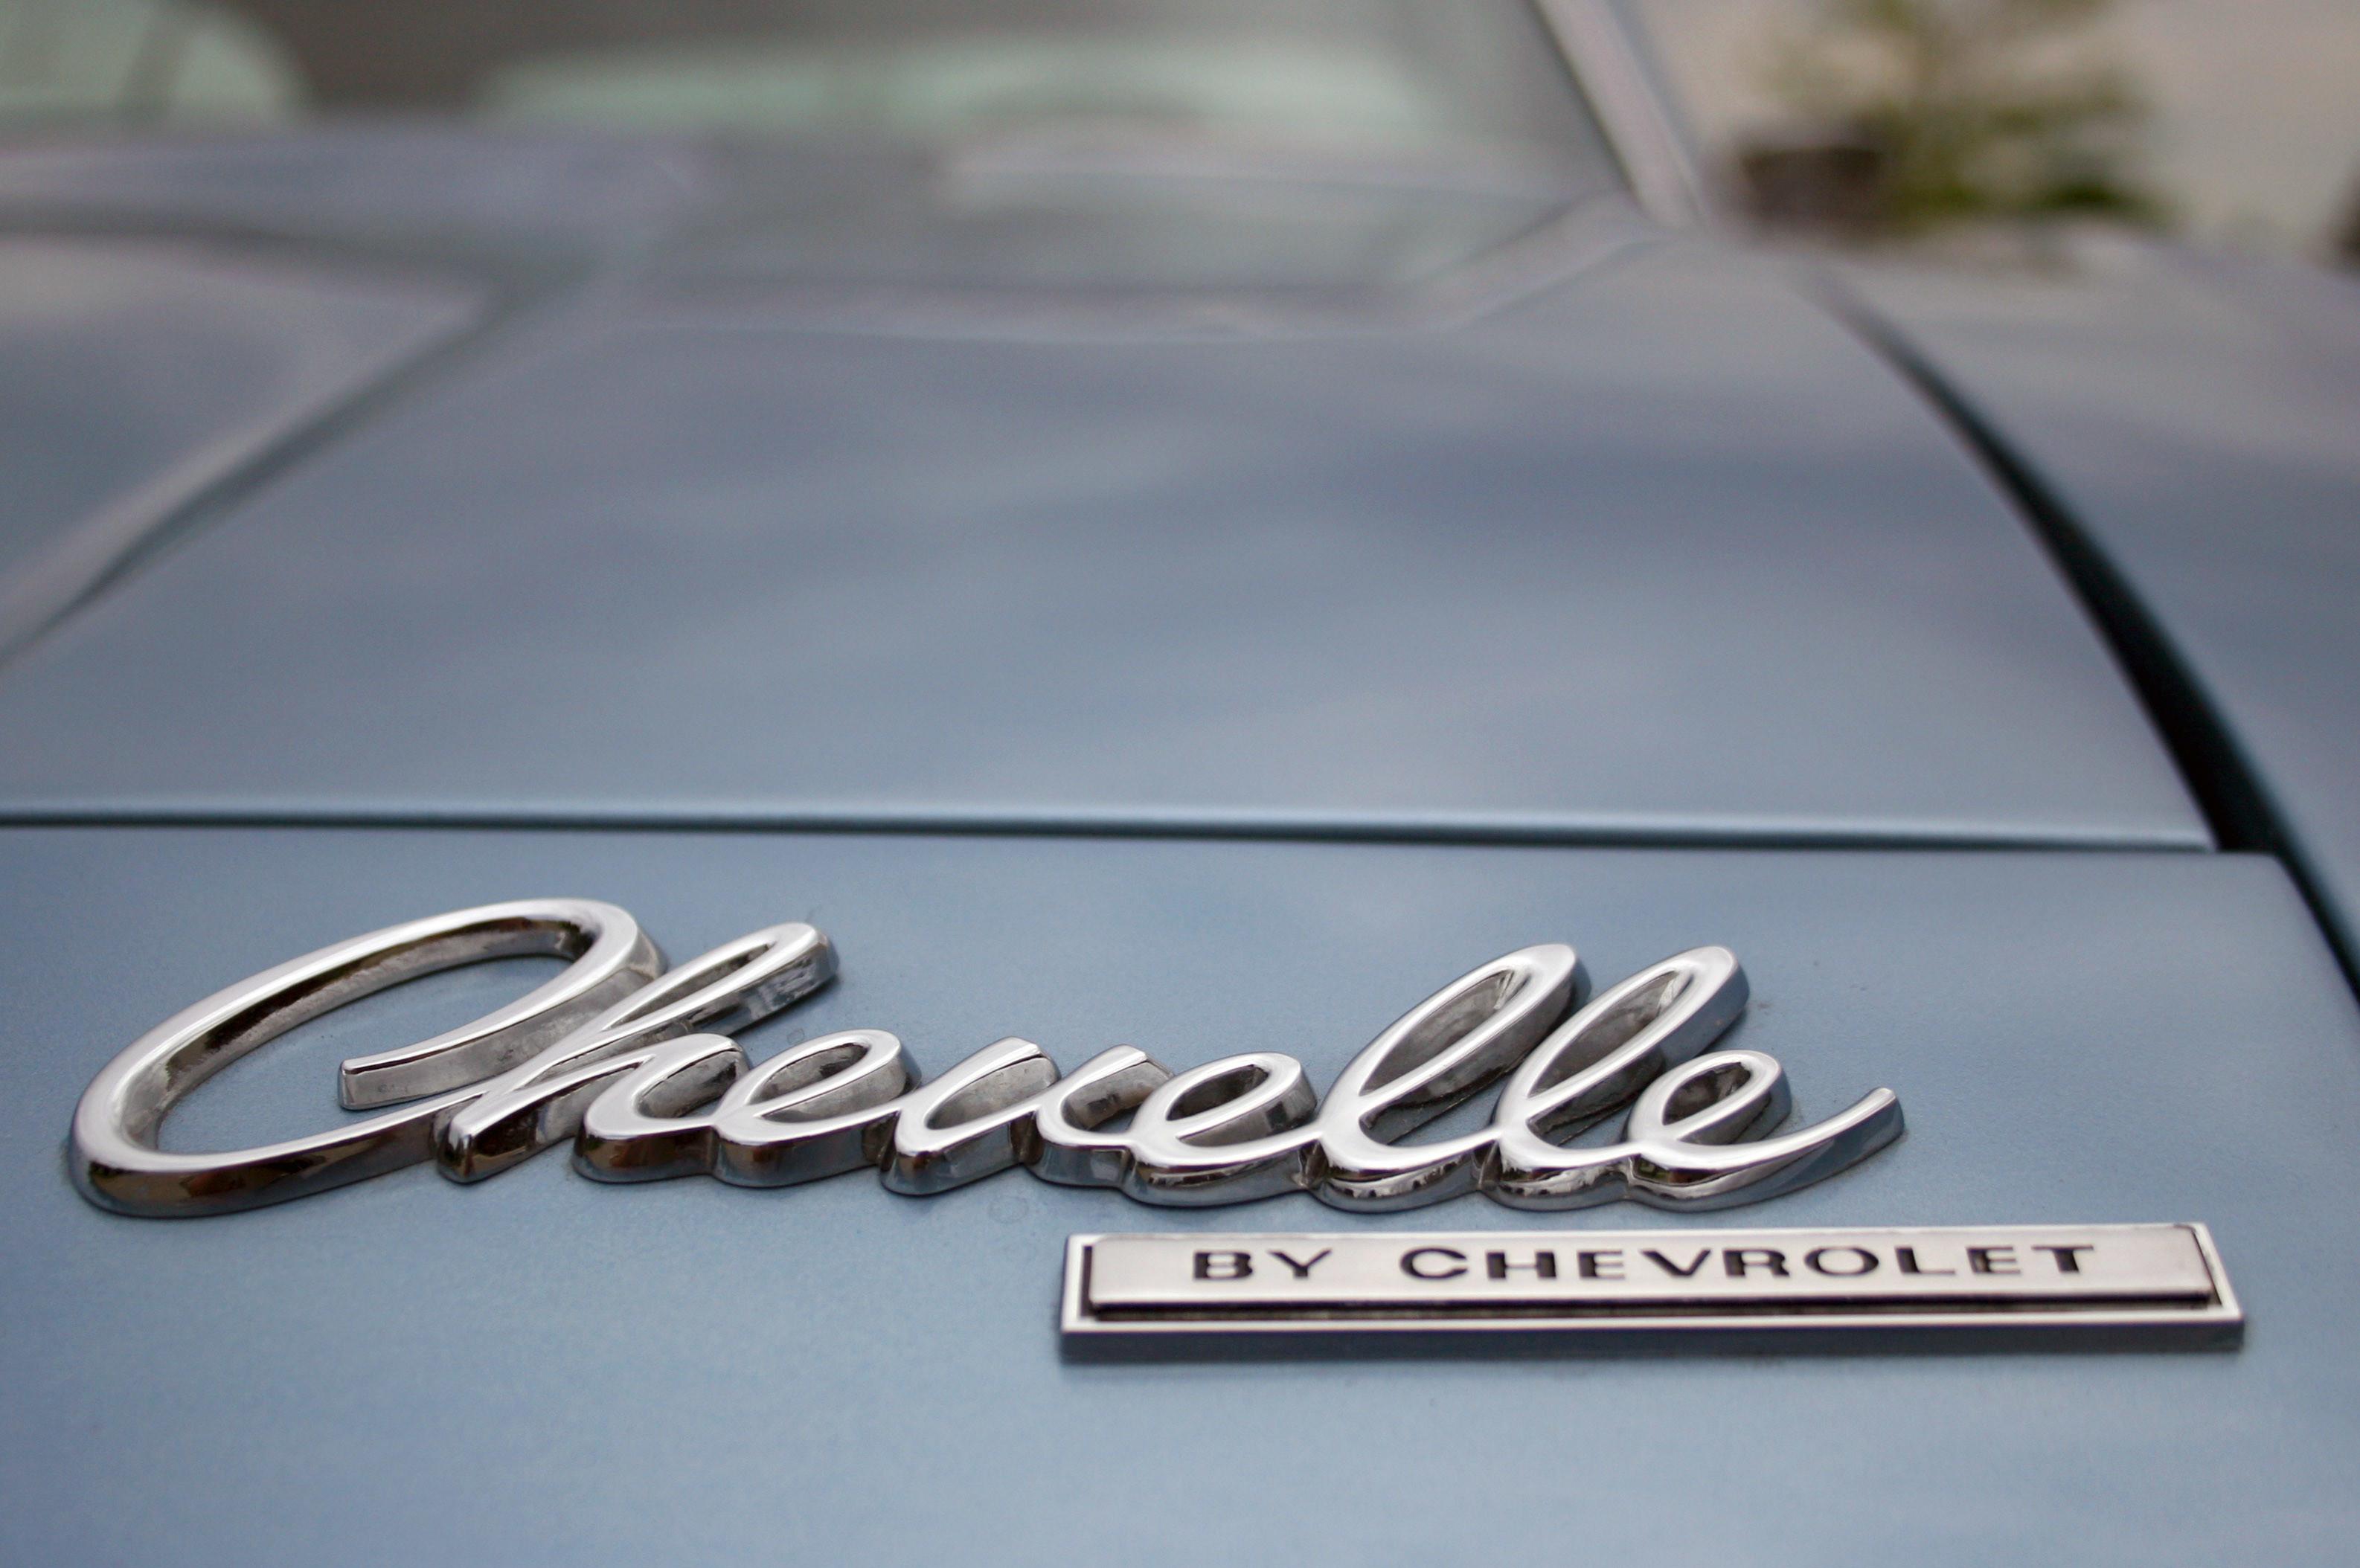 69 Chevelle Wallpaper 1080p